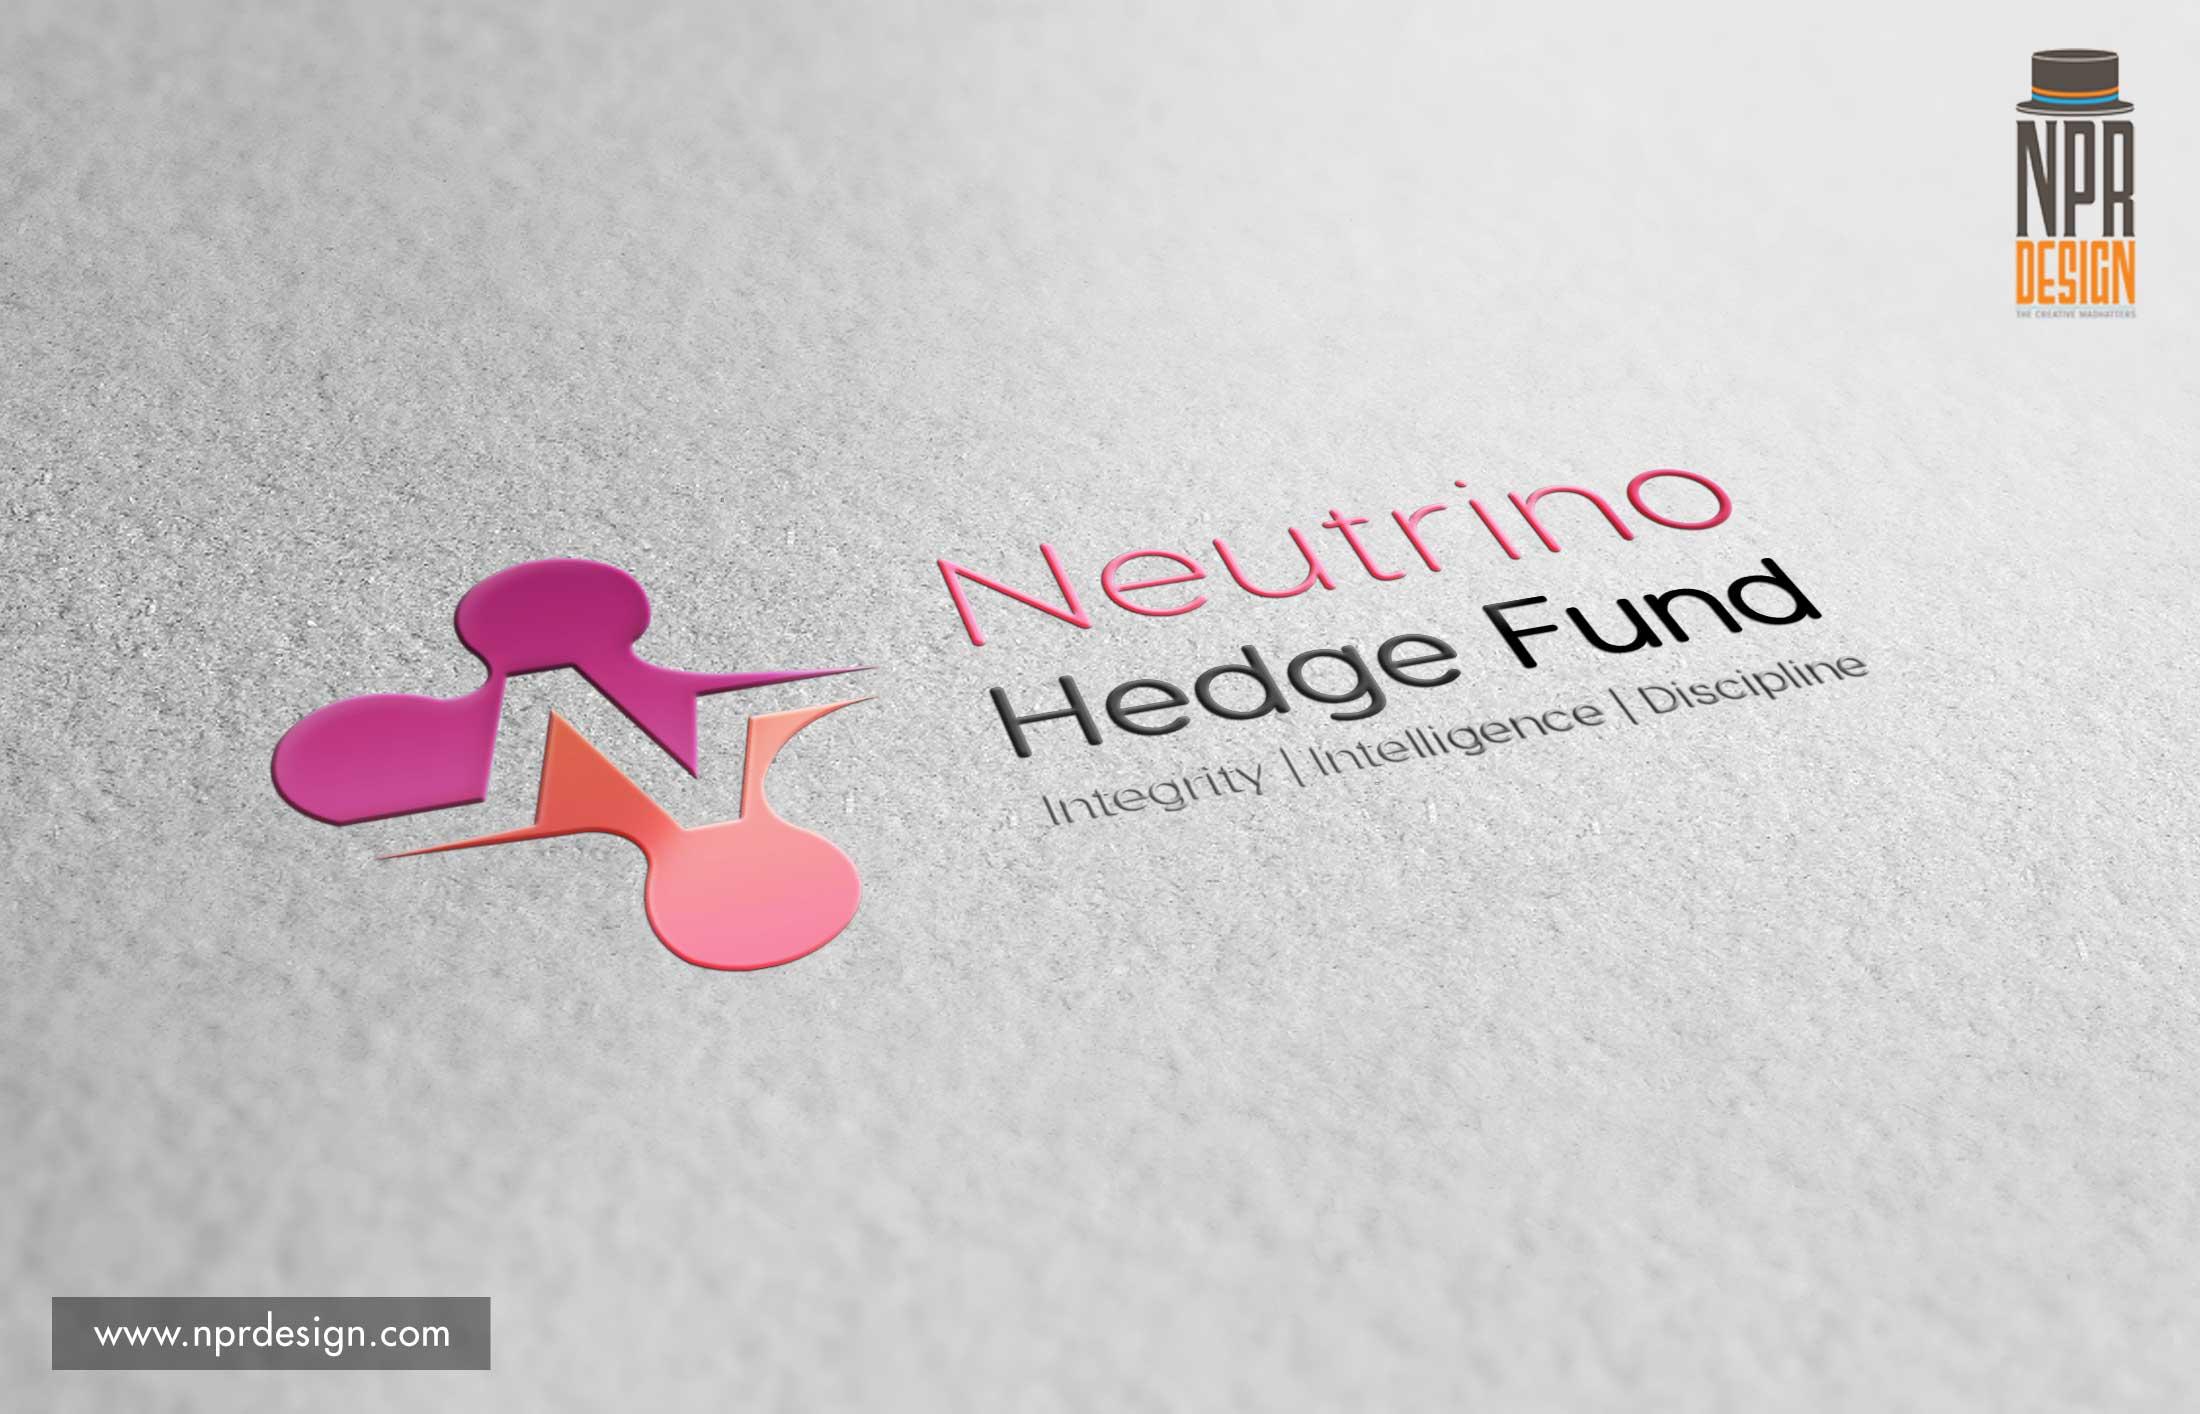 Neutrino Hedge Fund